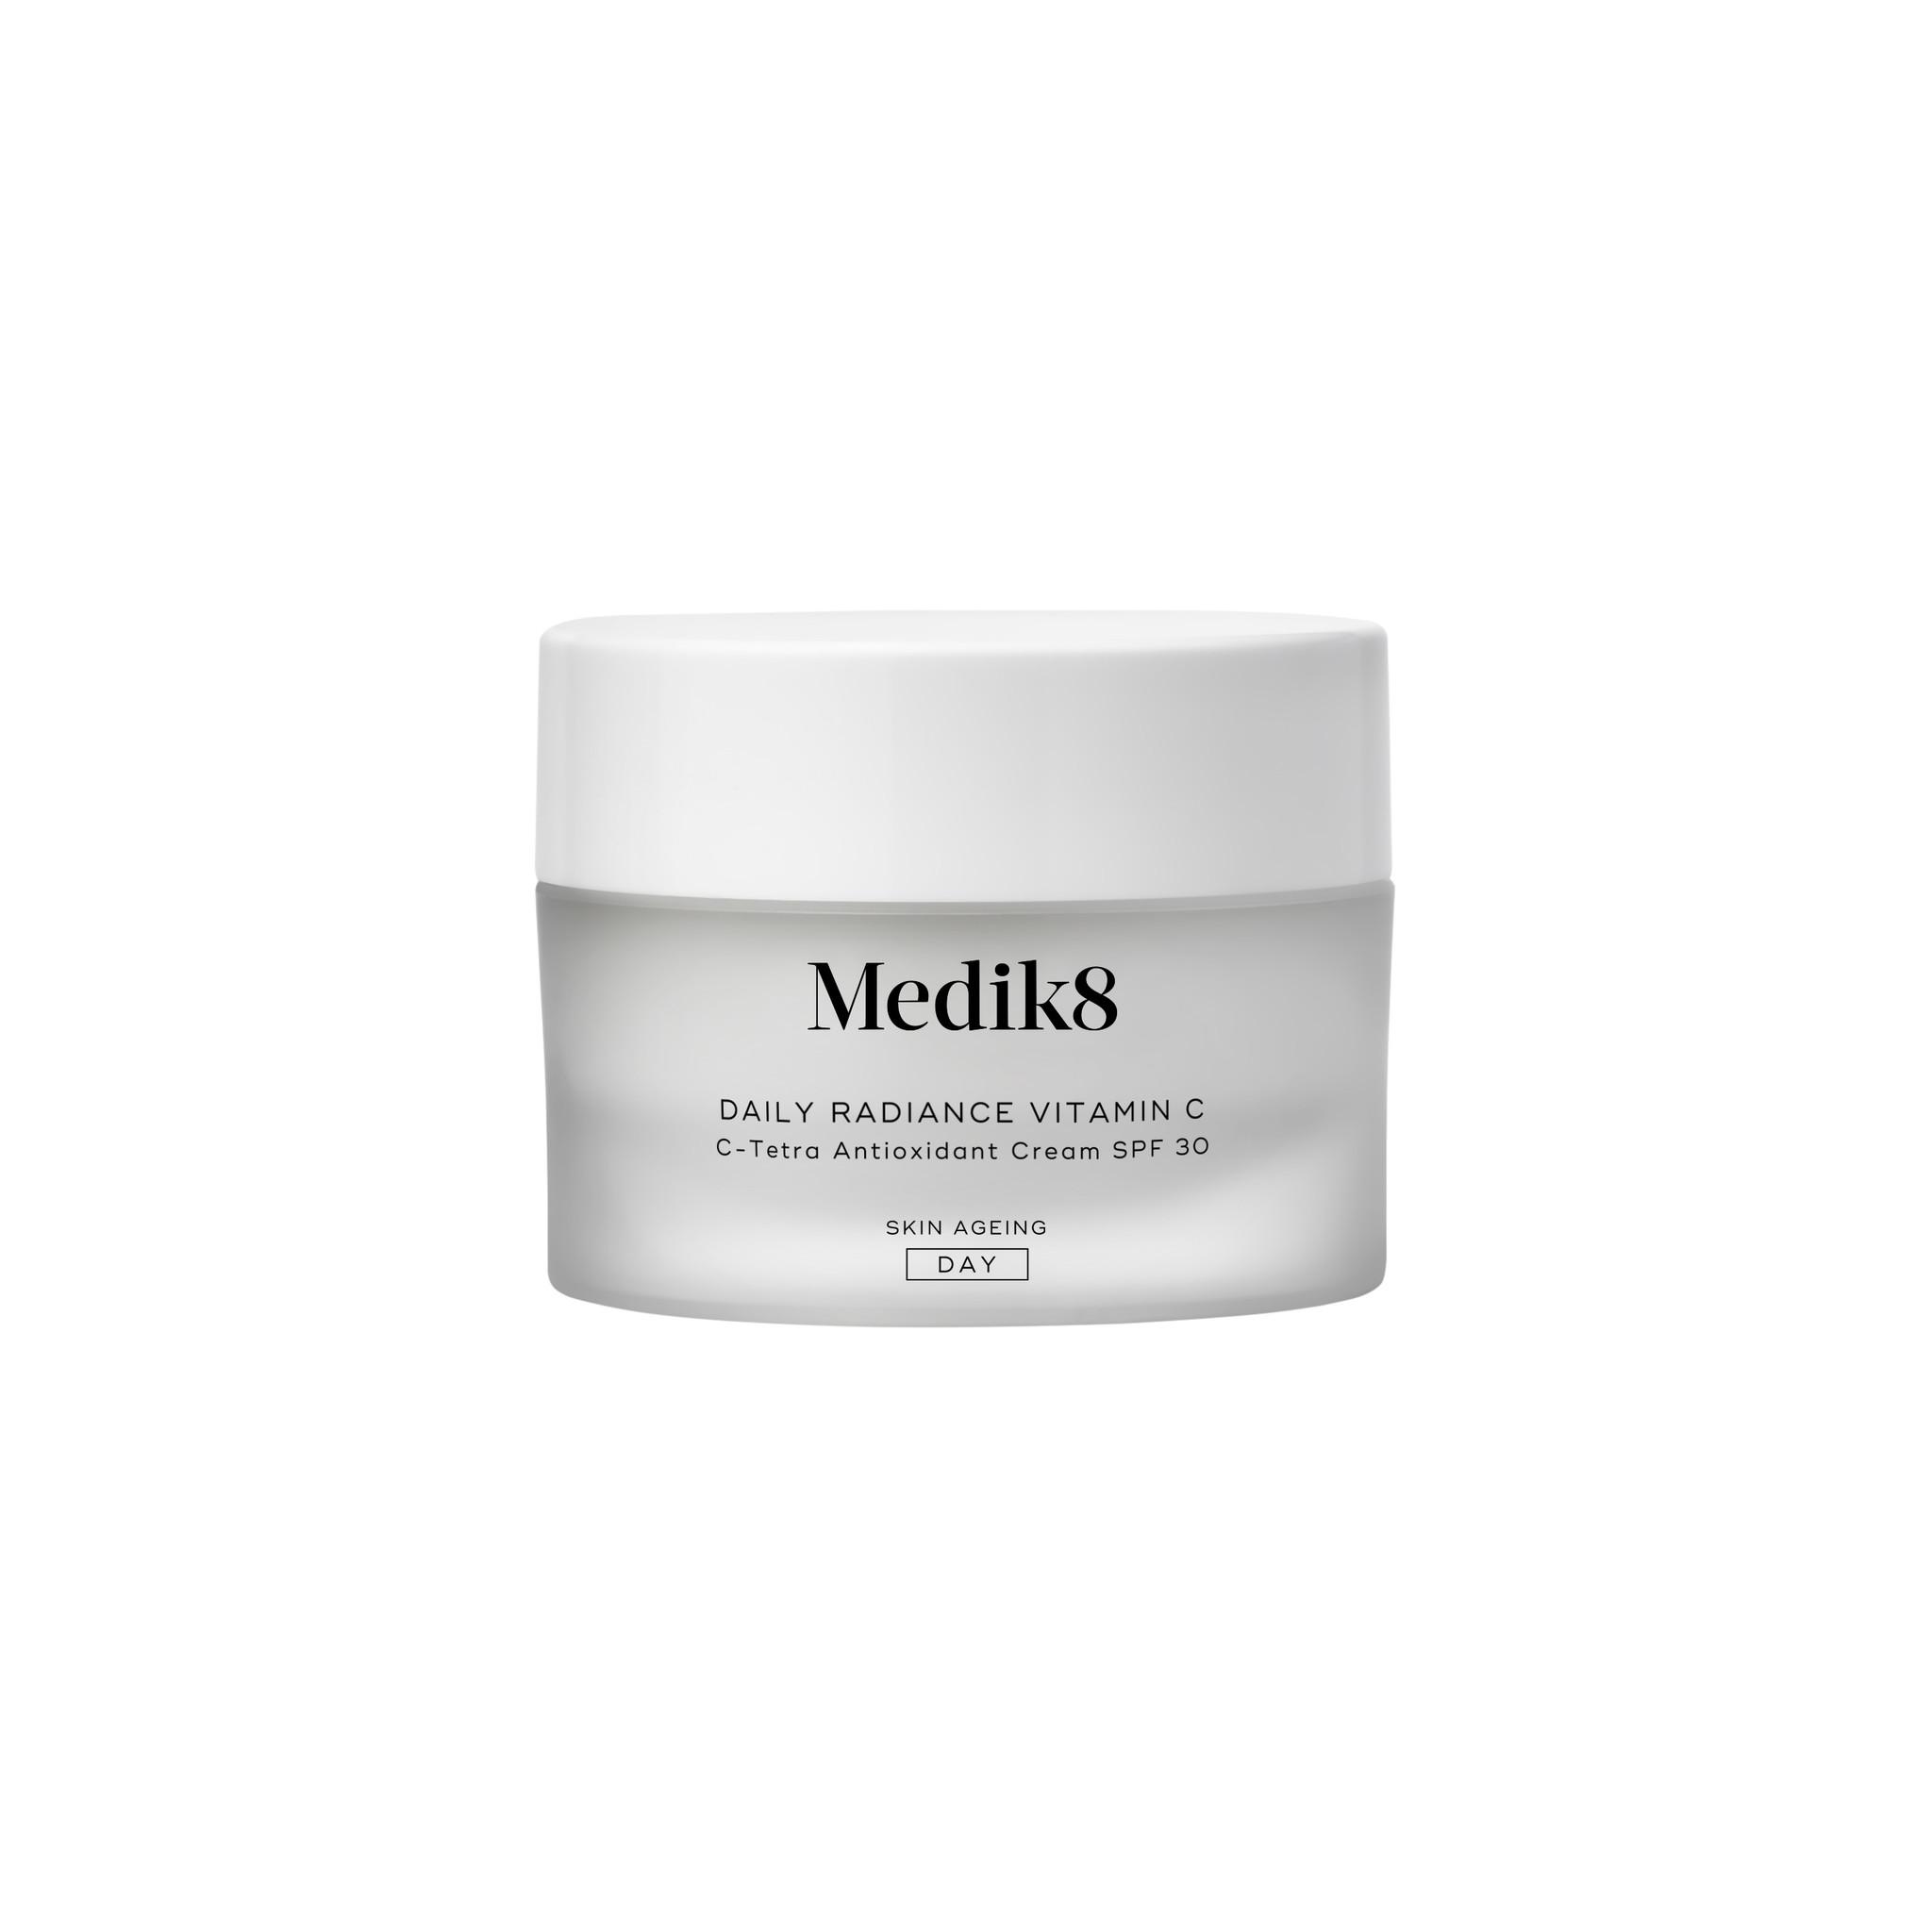 Medik8 Medik8 Try me Size: Daily Radiance Vitamin C (12,5 ml)